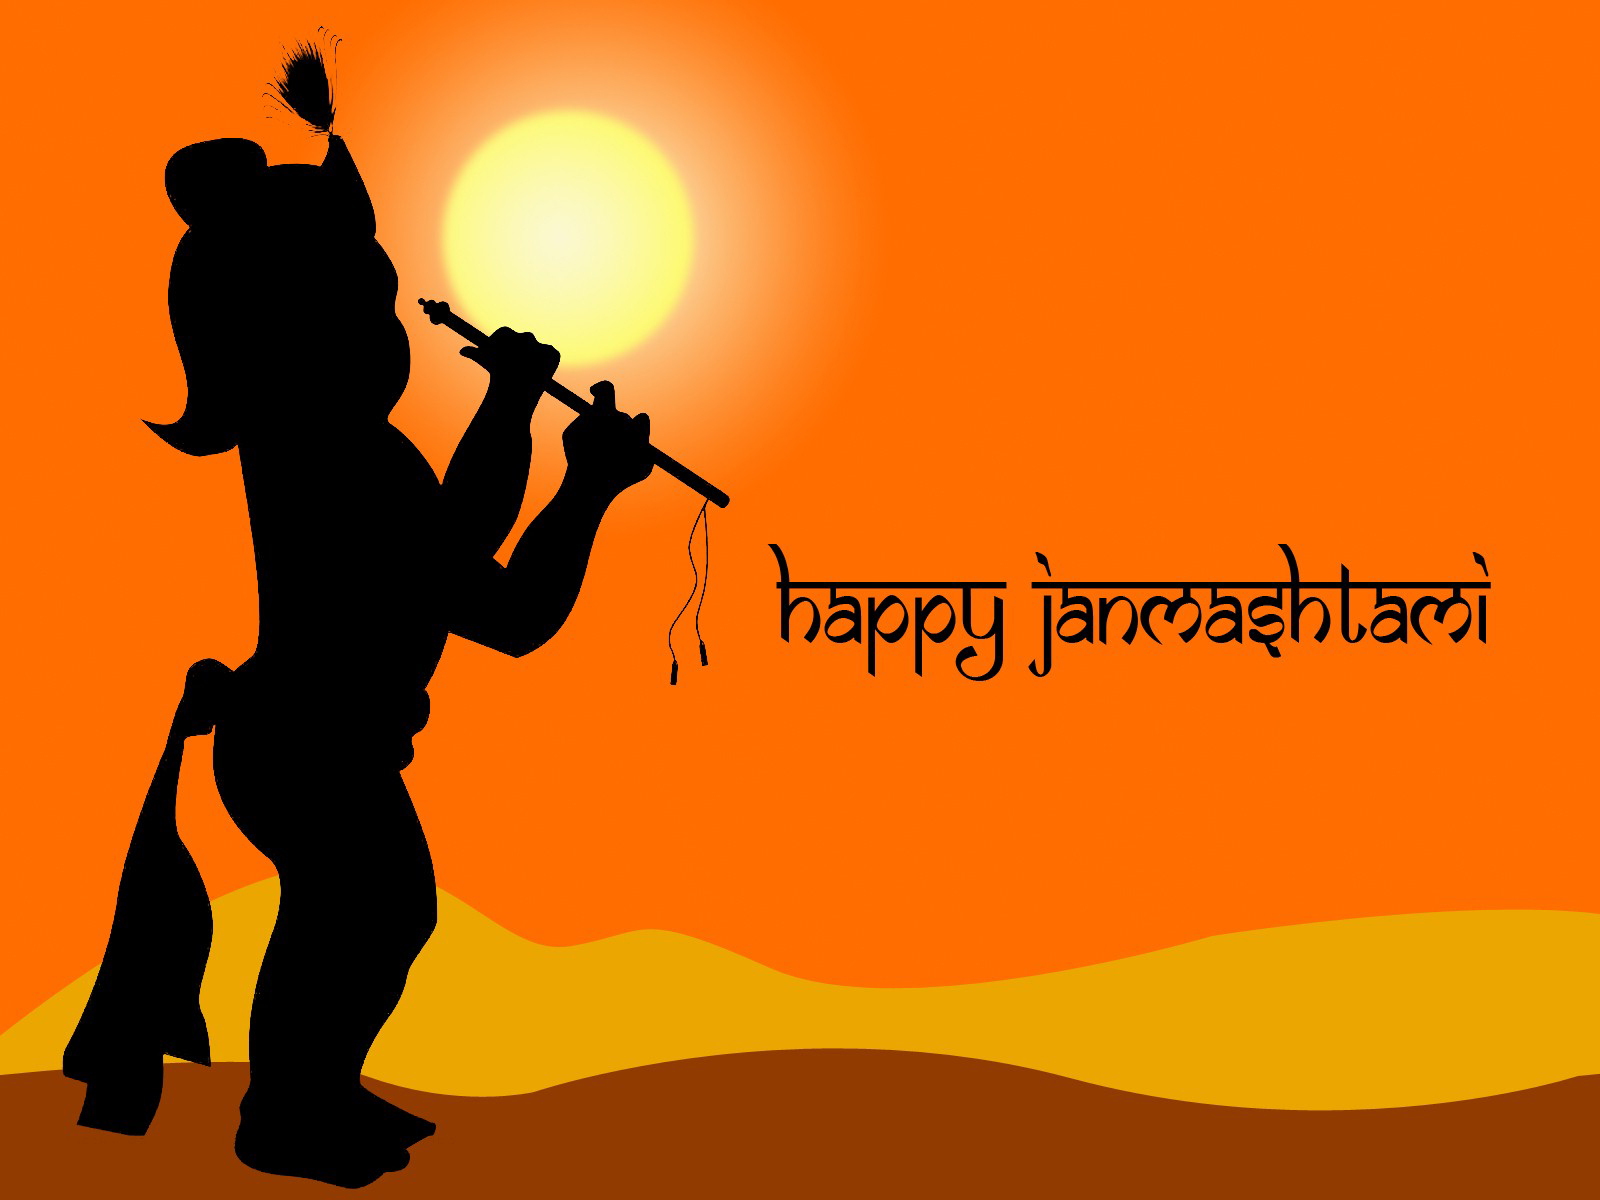 Letest Happy Krishna Janmashtami Full HD Wallpapers ou can